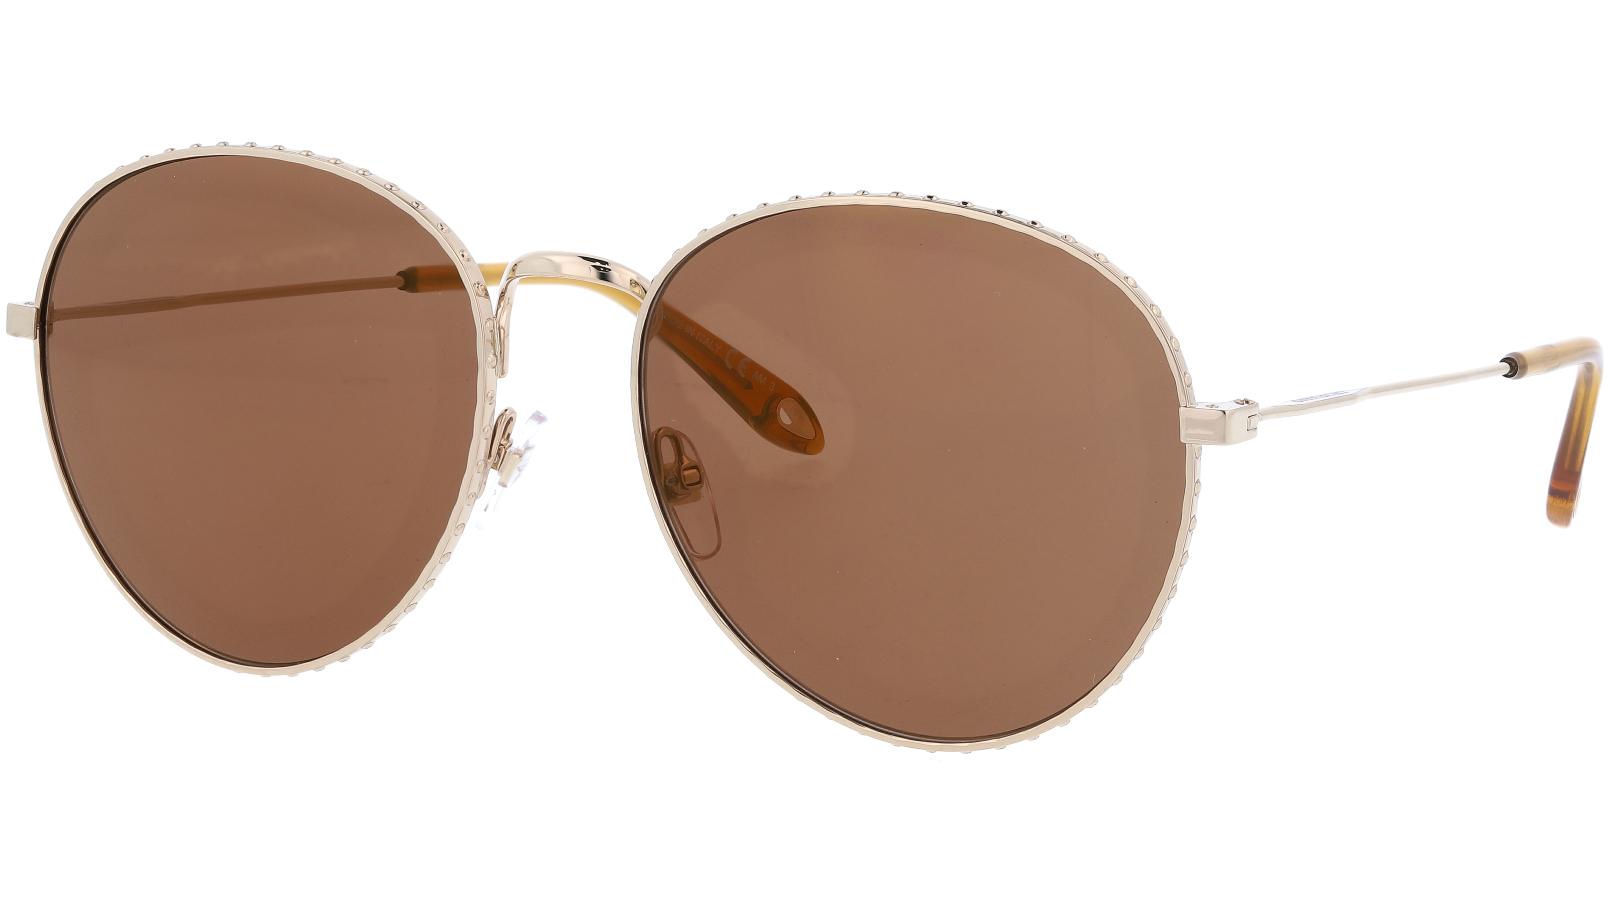 GIVENCHY GV7089S PEFMT 60 GOLD Sunglasses